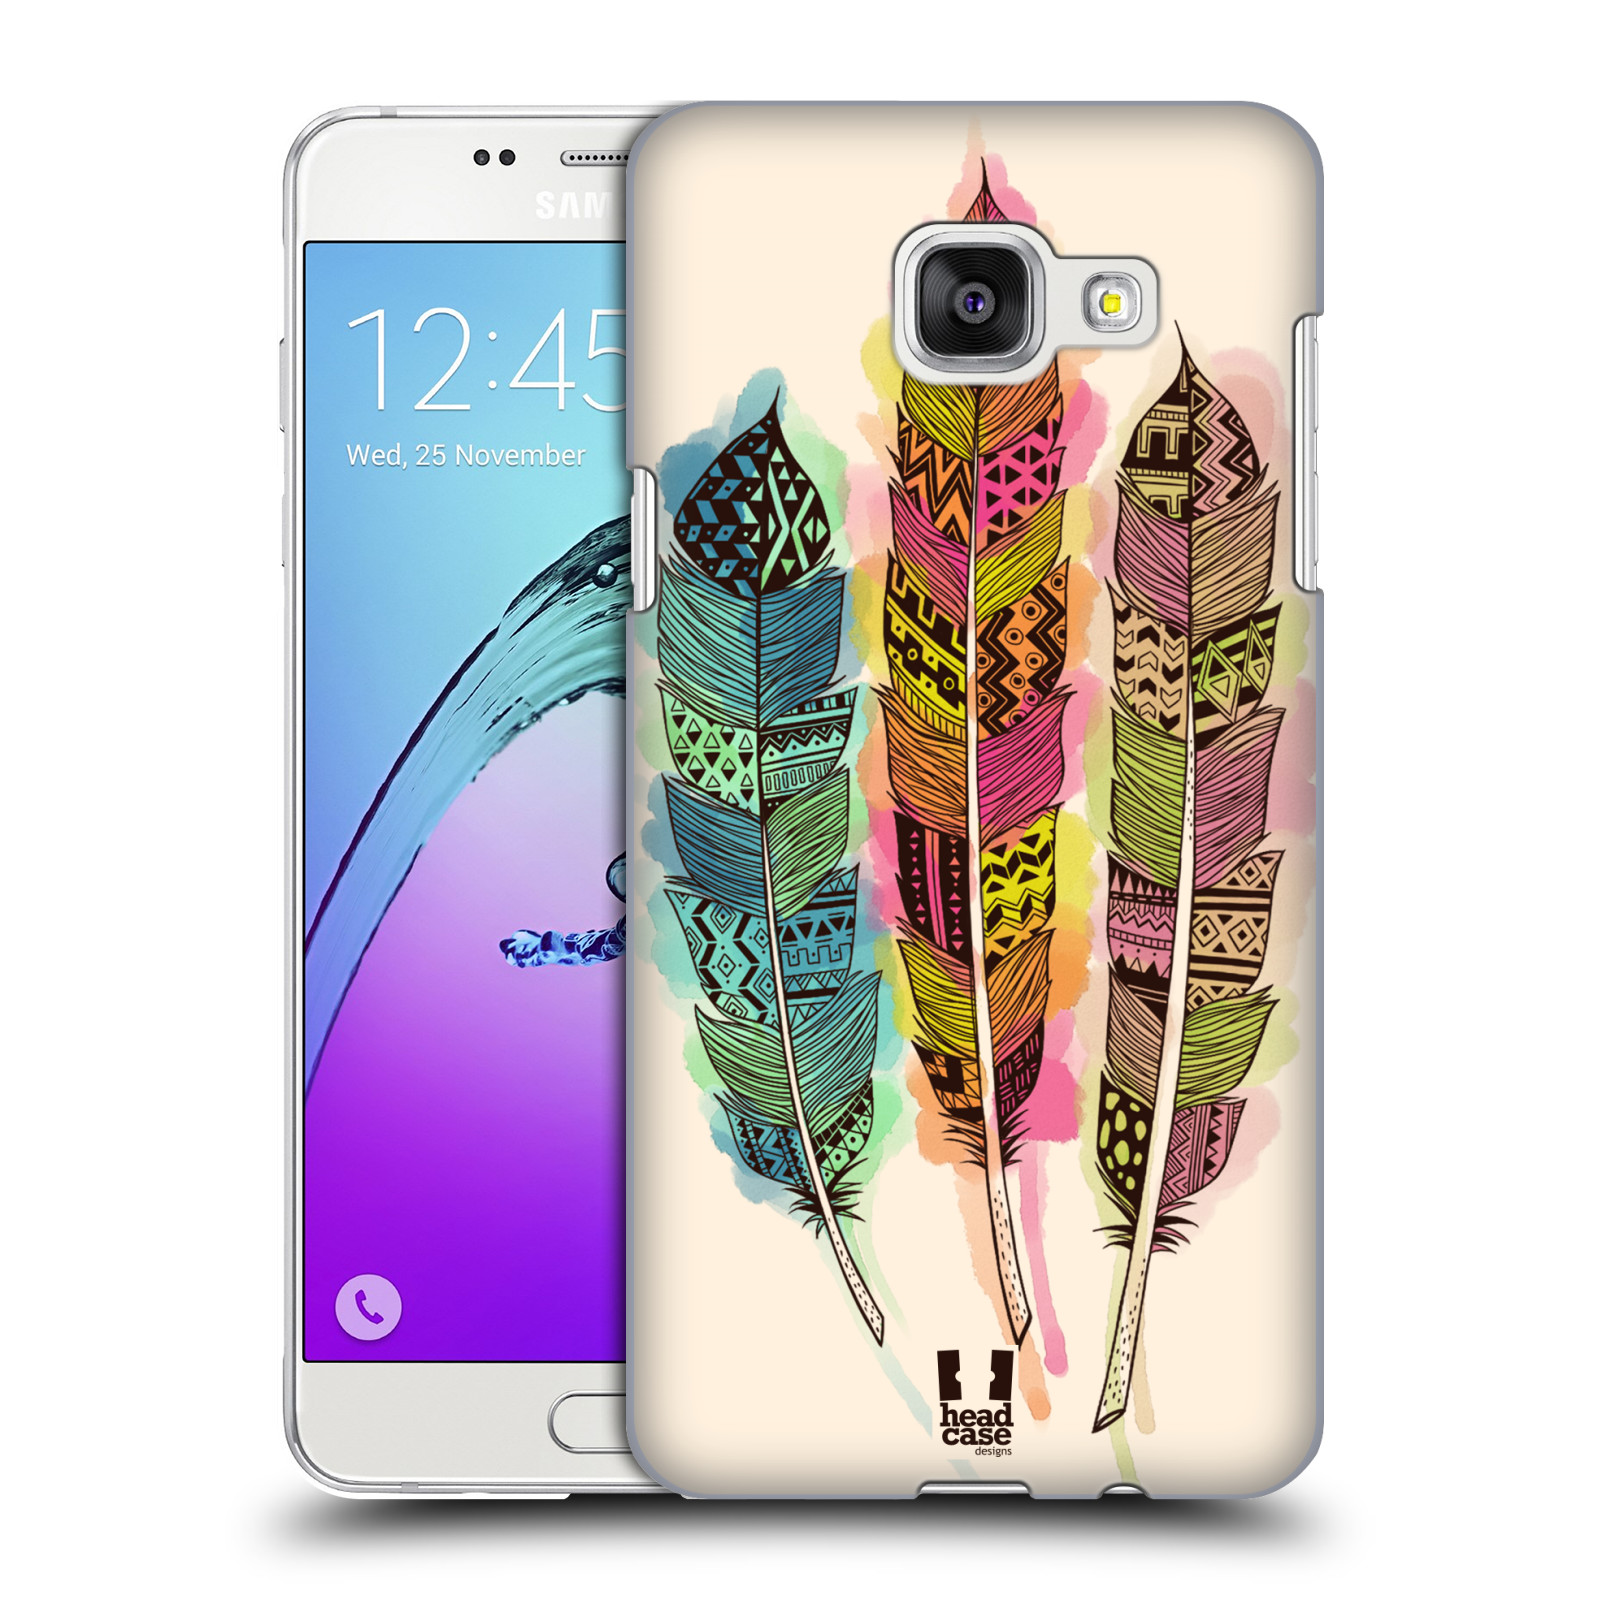 Plastové pouzdro na mobil Samsung Galaxy A5 (2016) HEAD CASE AZTEC PÍRKA SPLASH